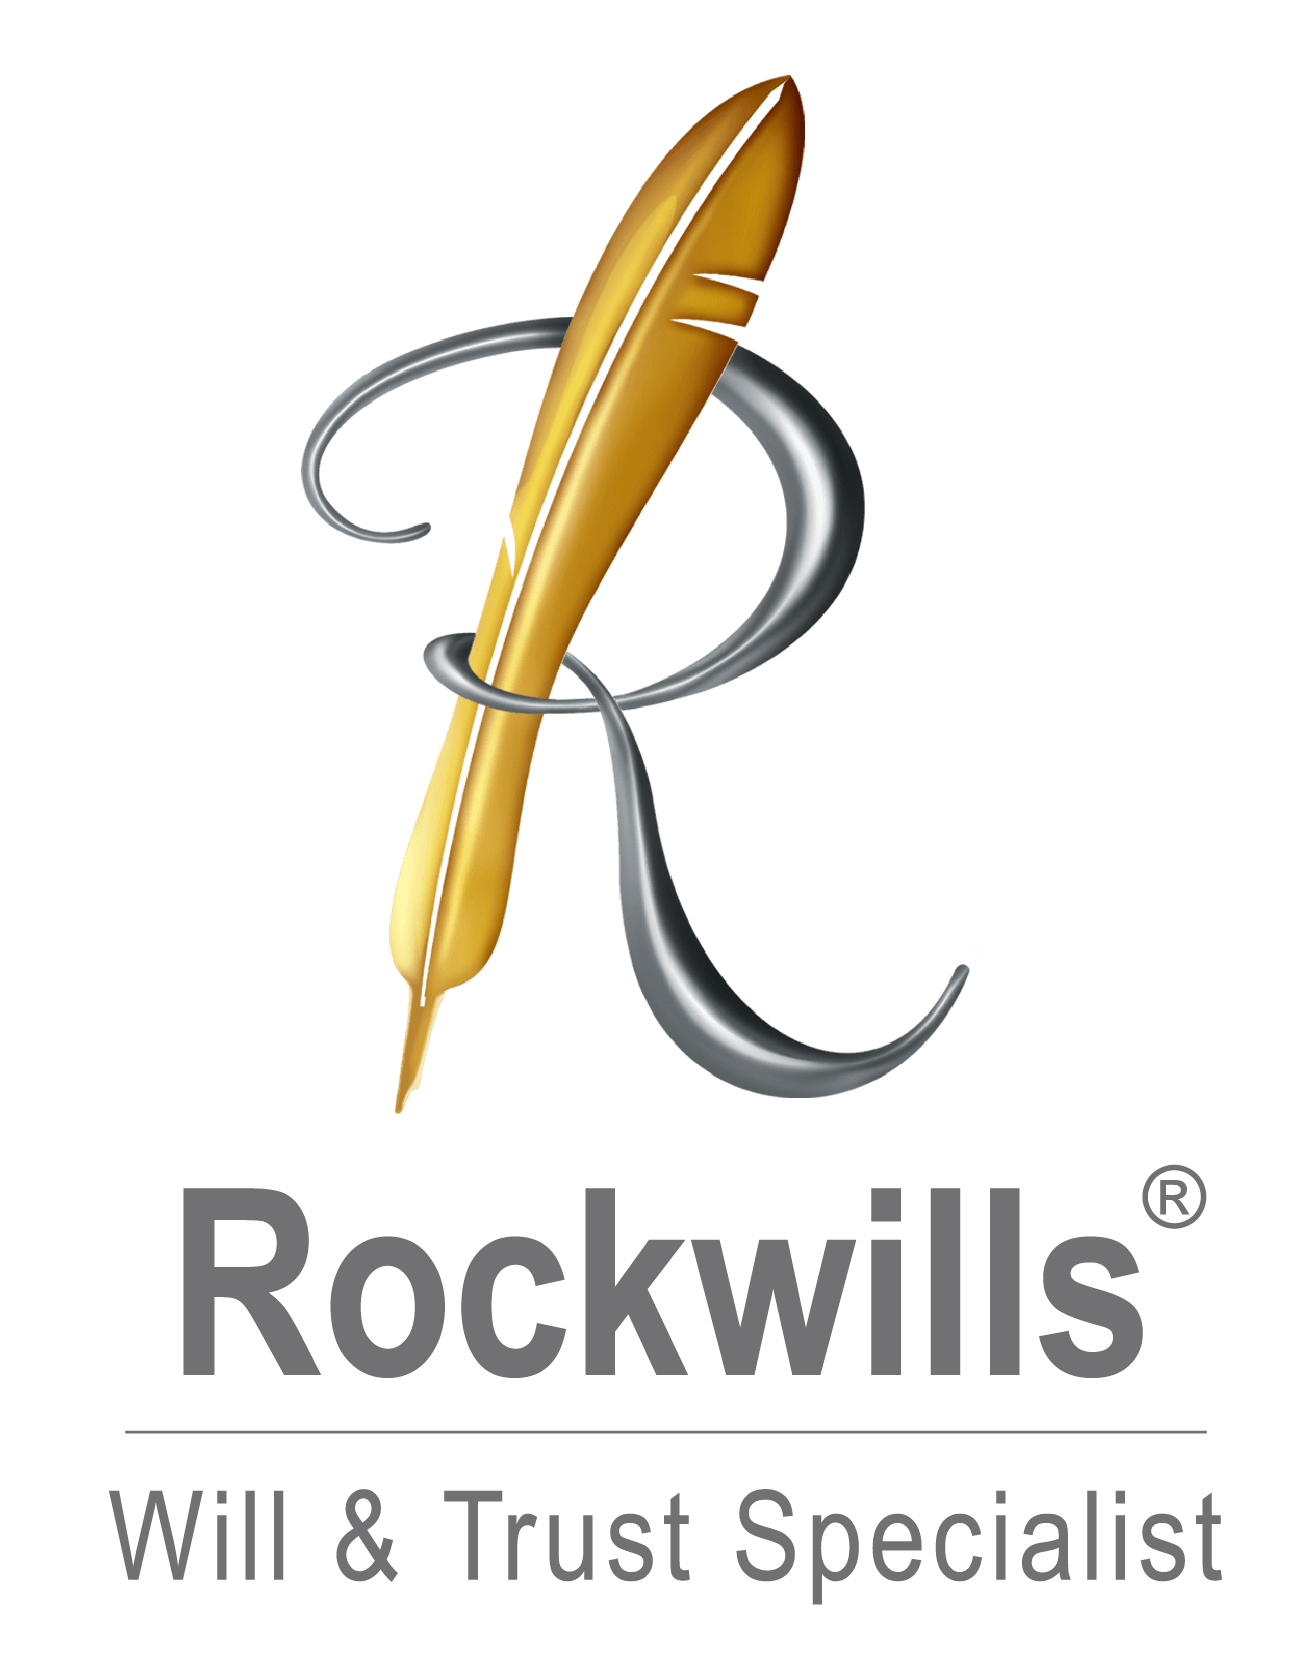 Rockwills Corporation